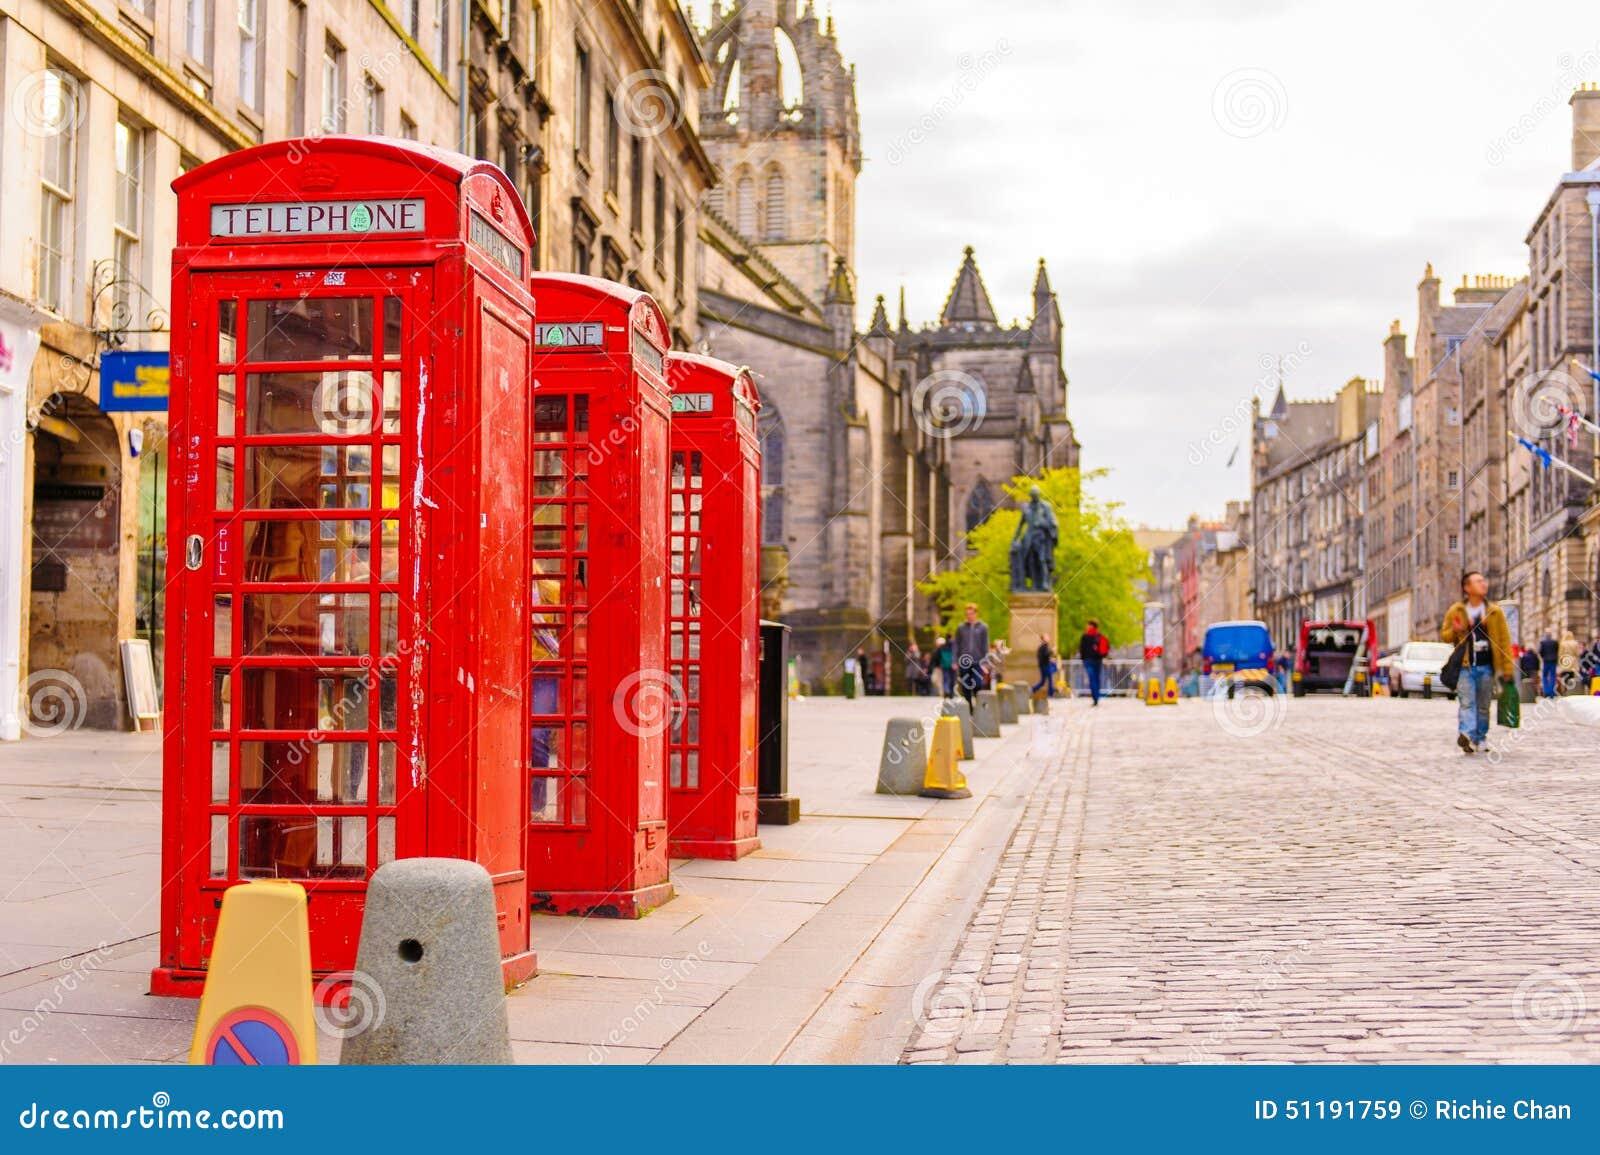 Street view of Edinburgh, Scotland, UK